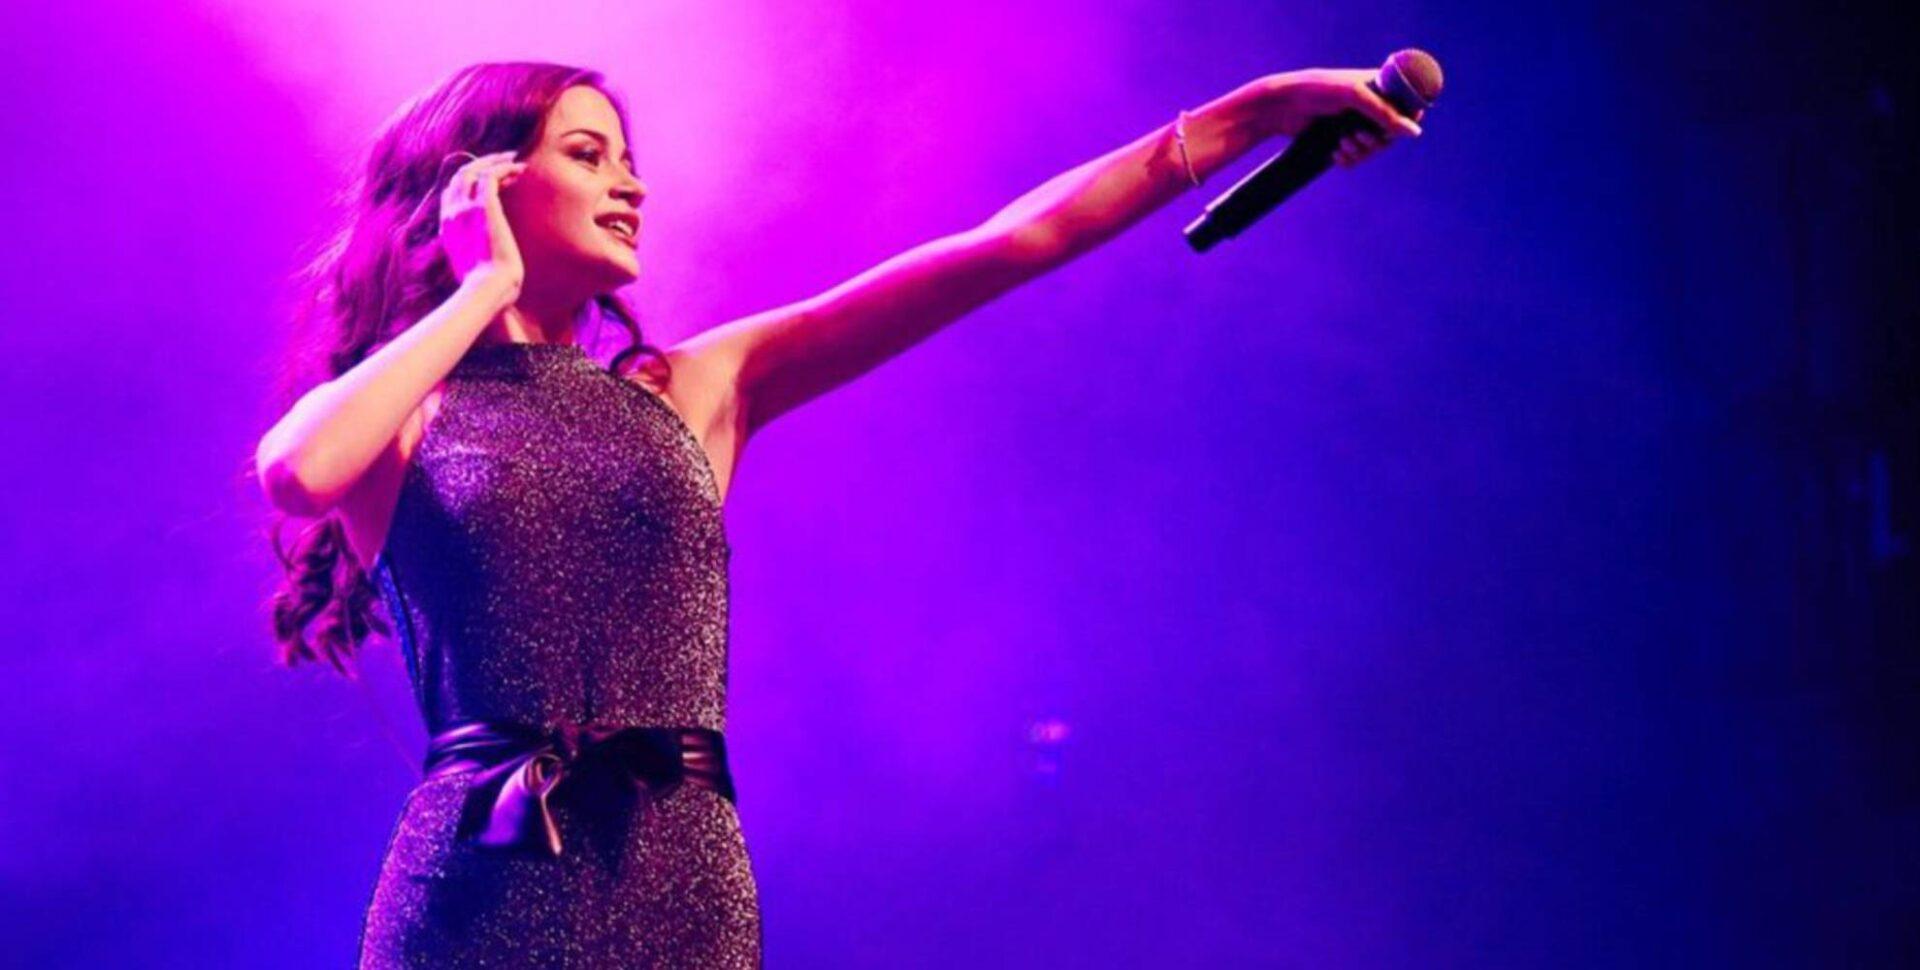 Stefania Liberakis eurovisie songfestival griekenland